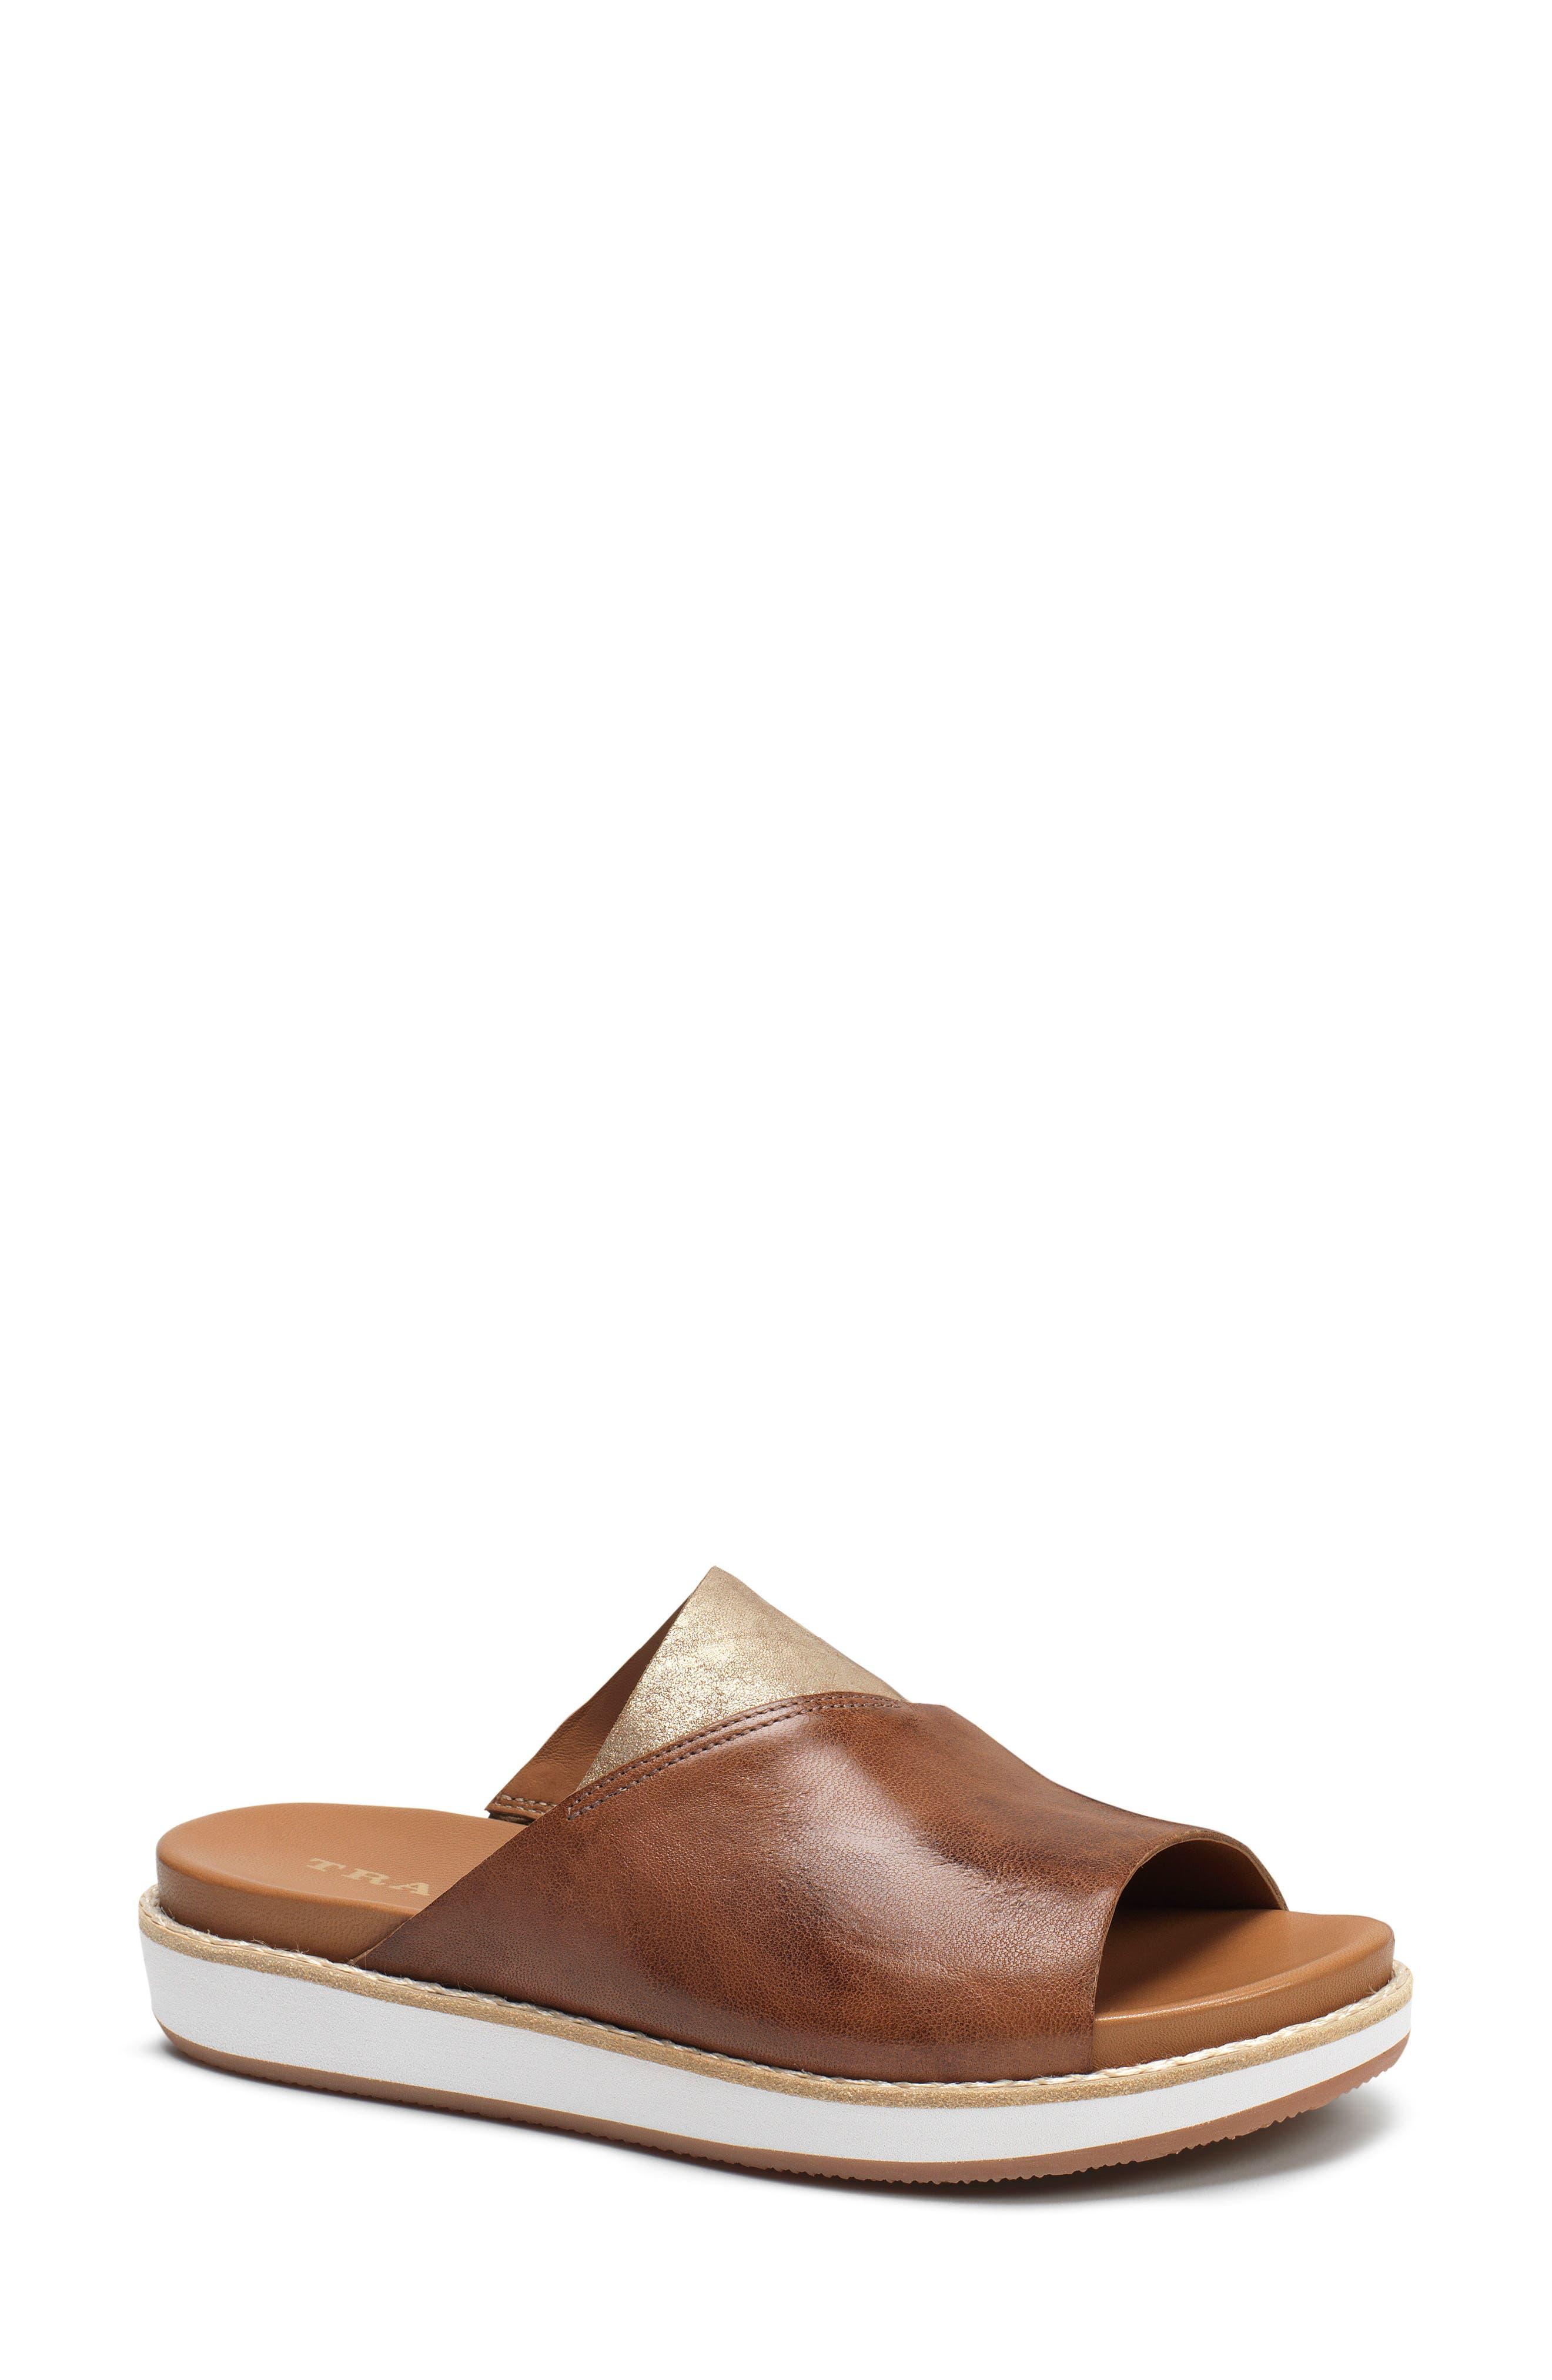 Codi Sandal,                         Main,                         color, TEAK LEATHER